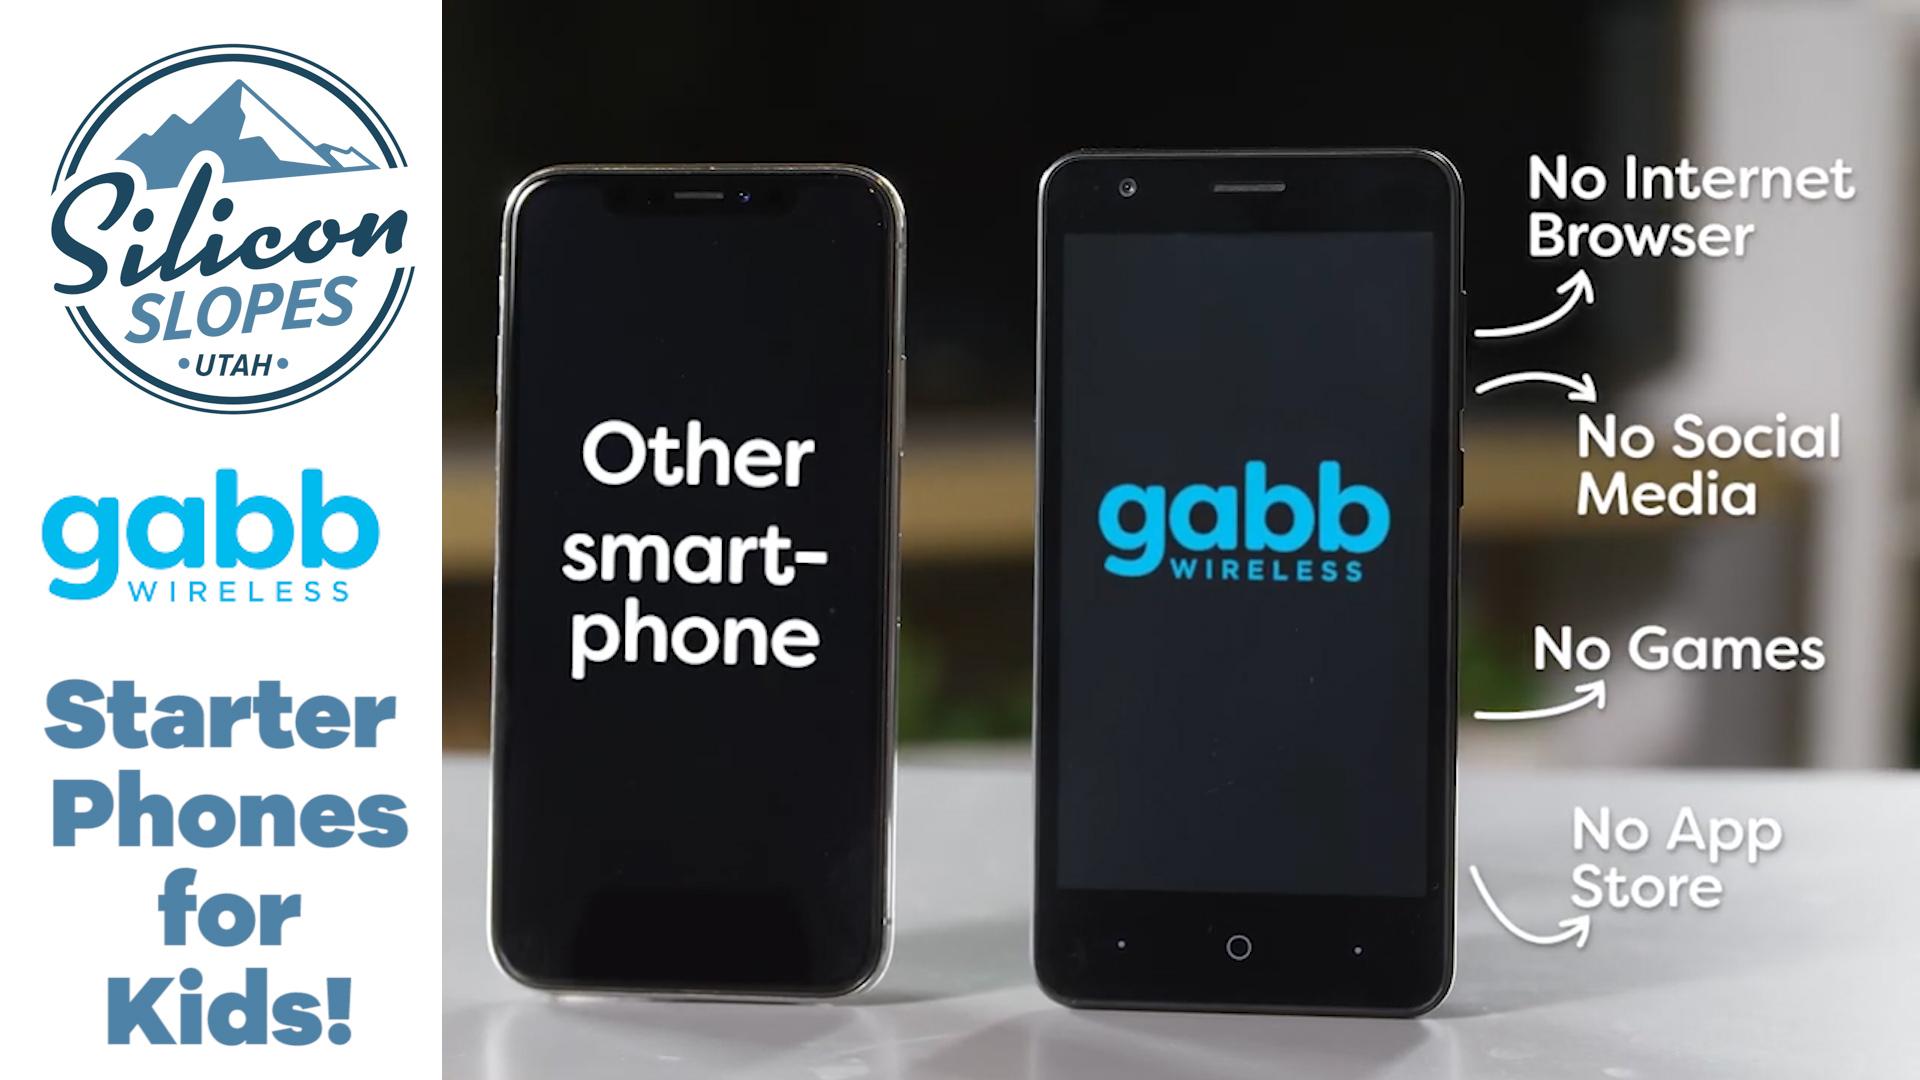 Gabb-Wireless-Thumbnail-1